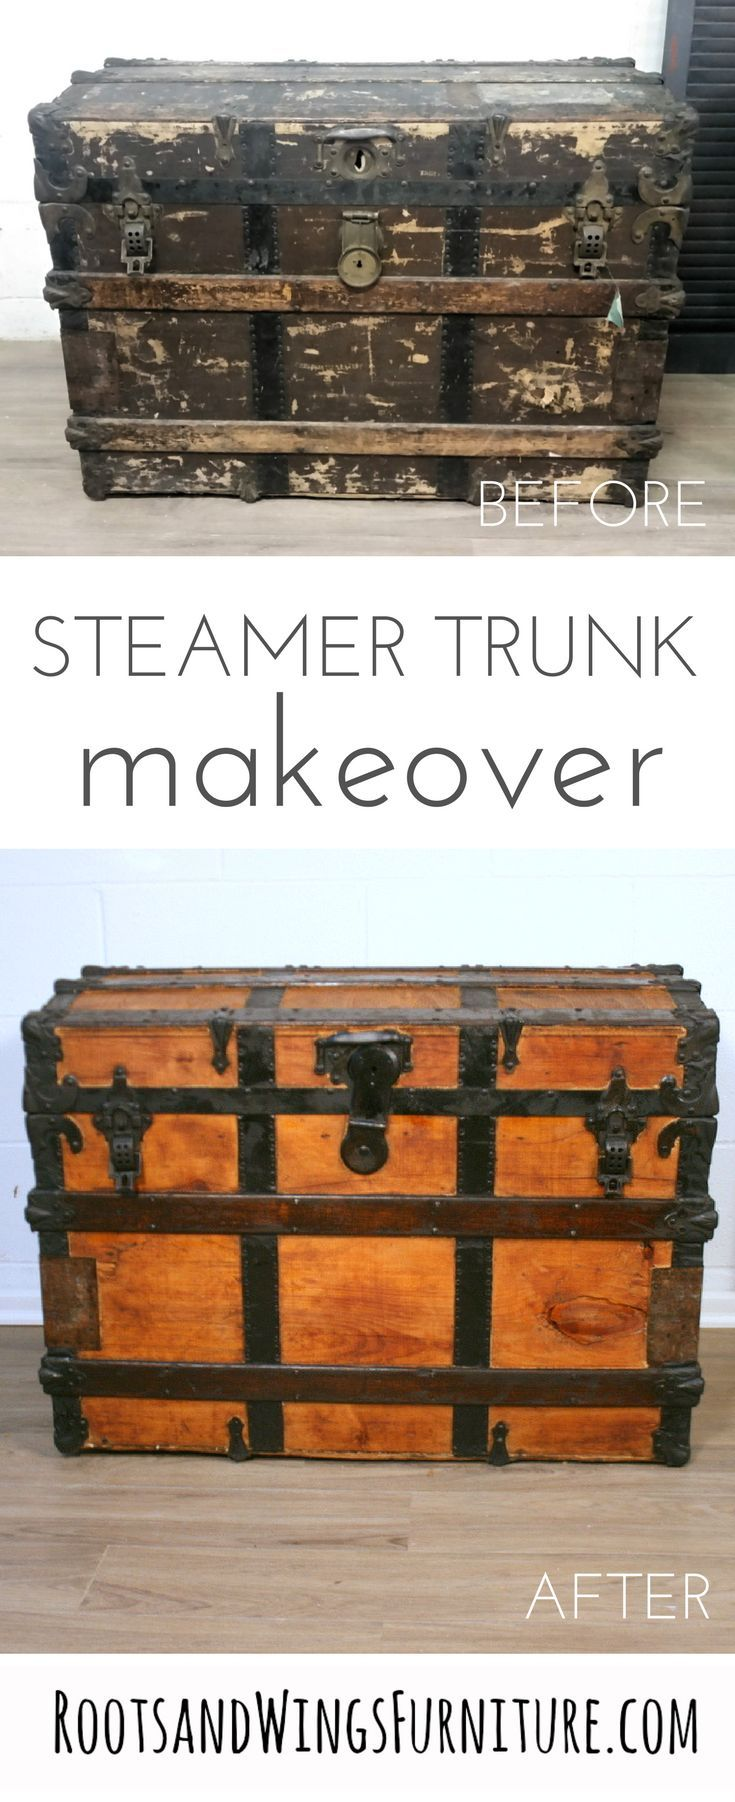 Steamer Trunk images